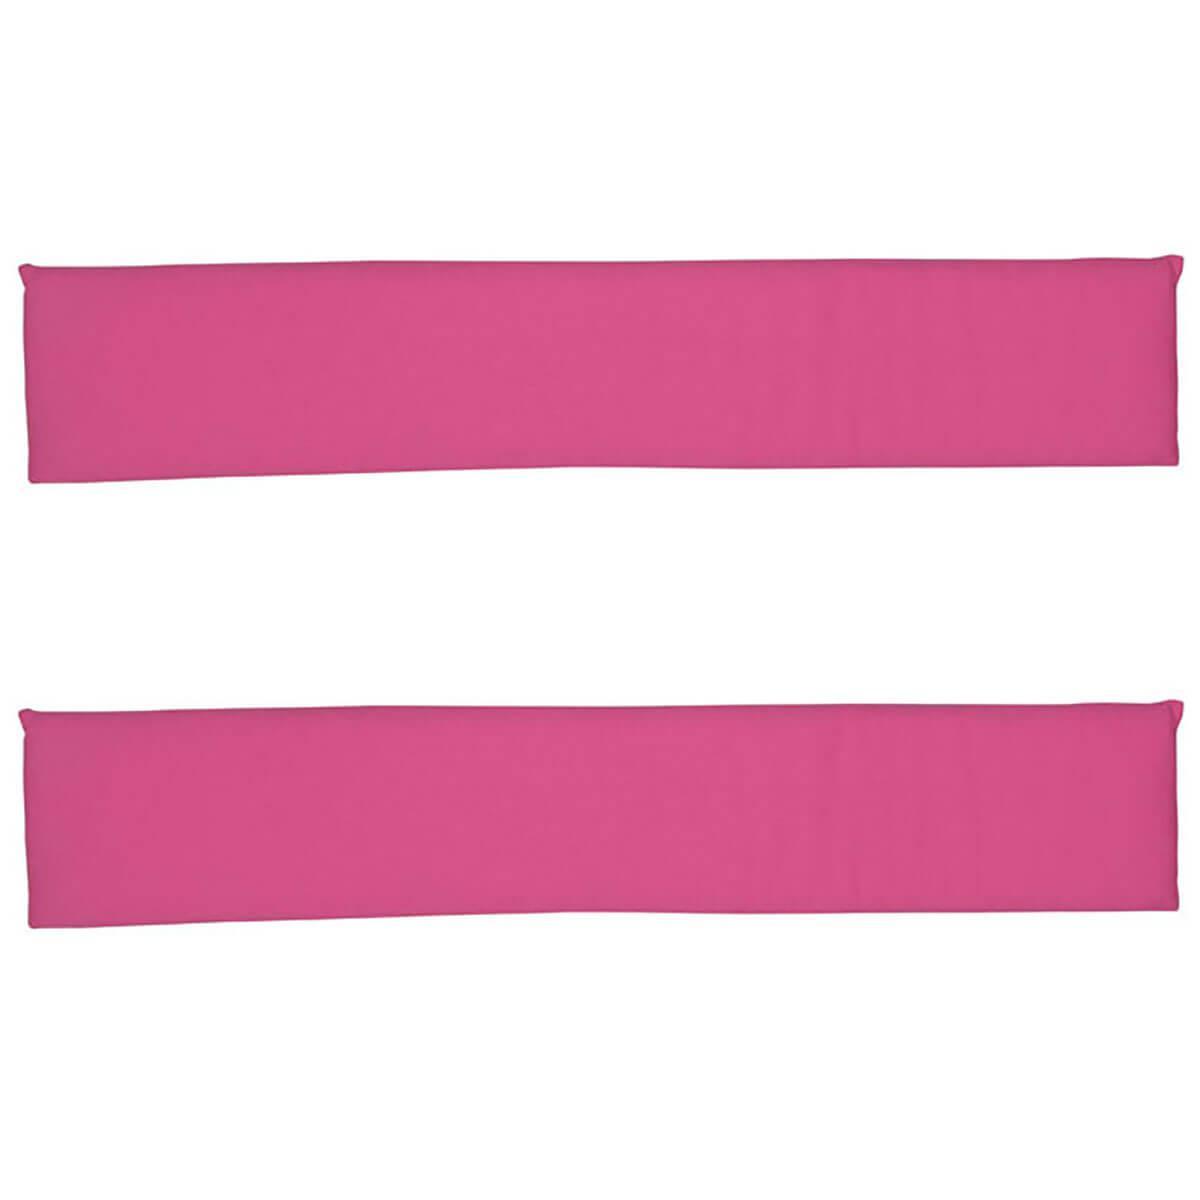 2 Zargenpolster DELUXE de Breuyn in rosa